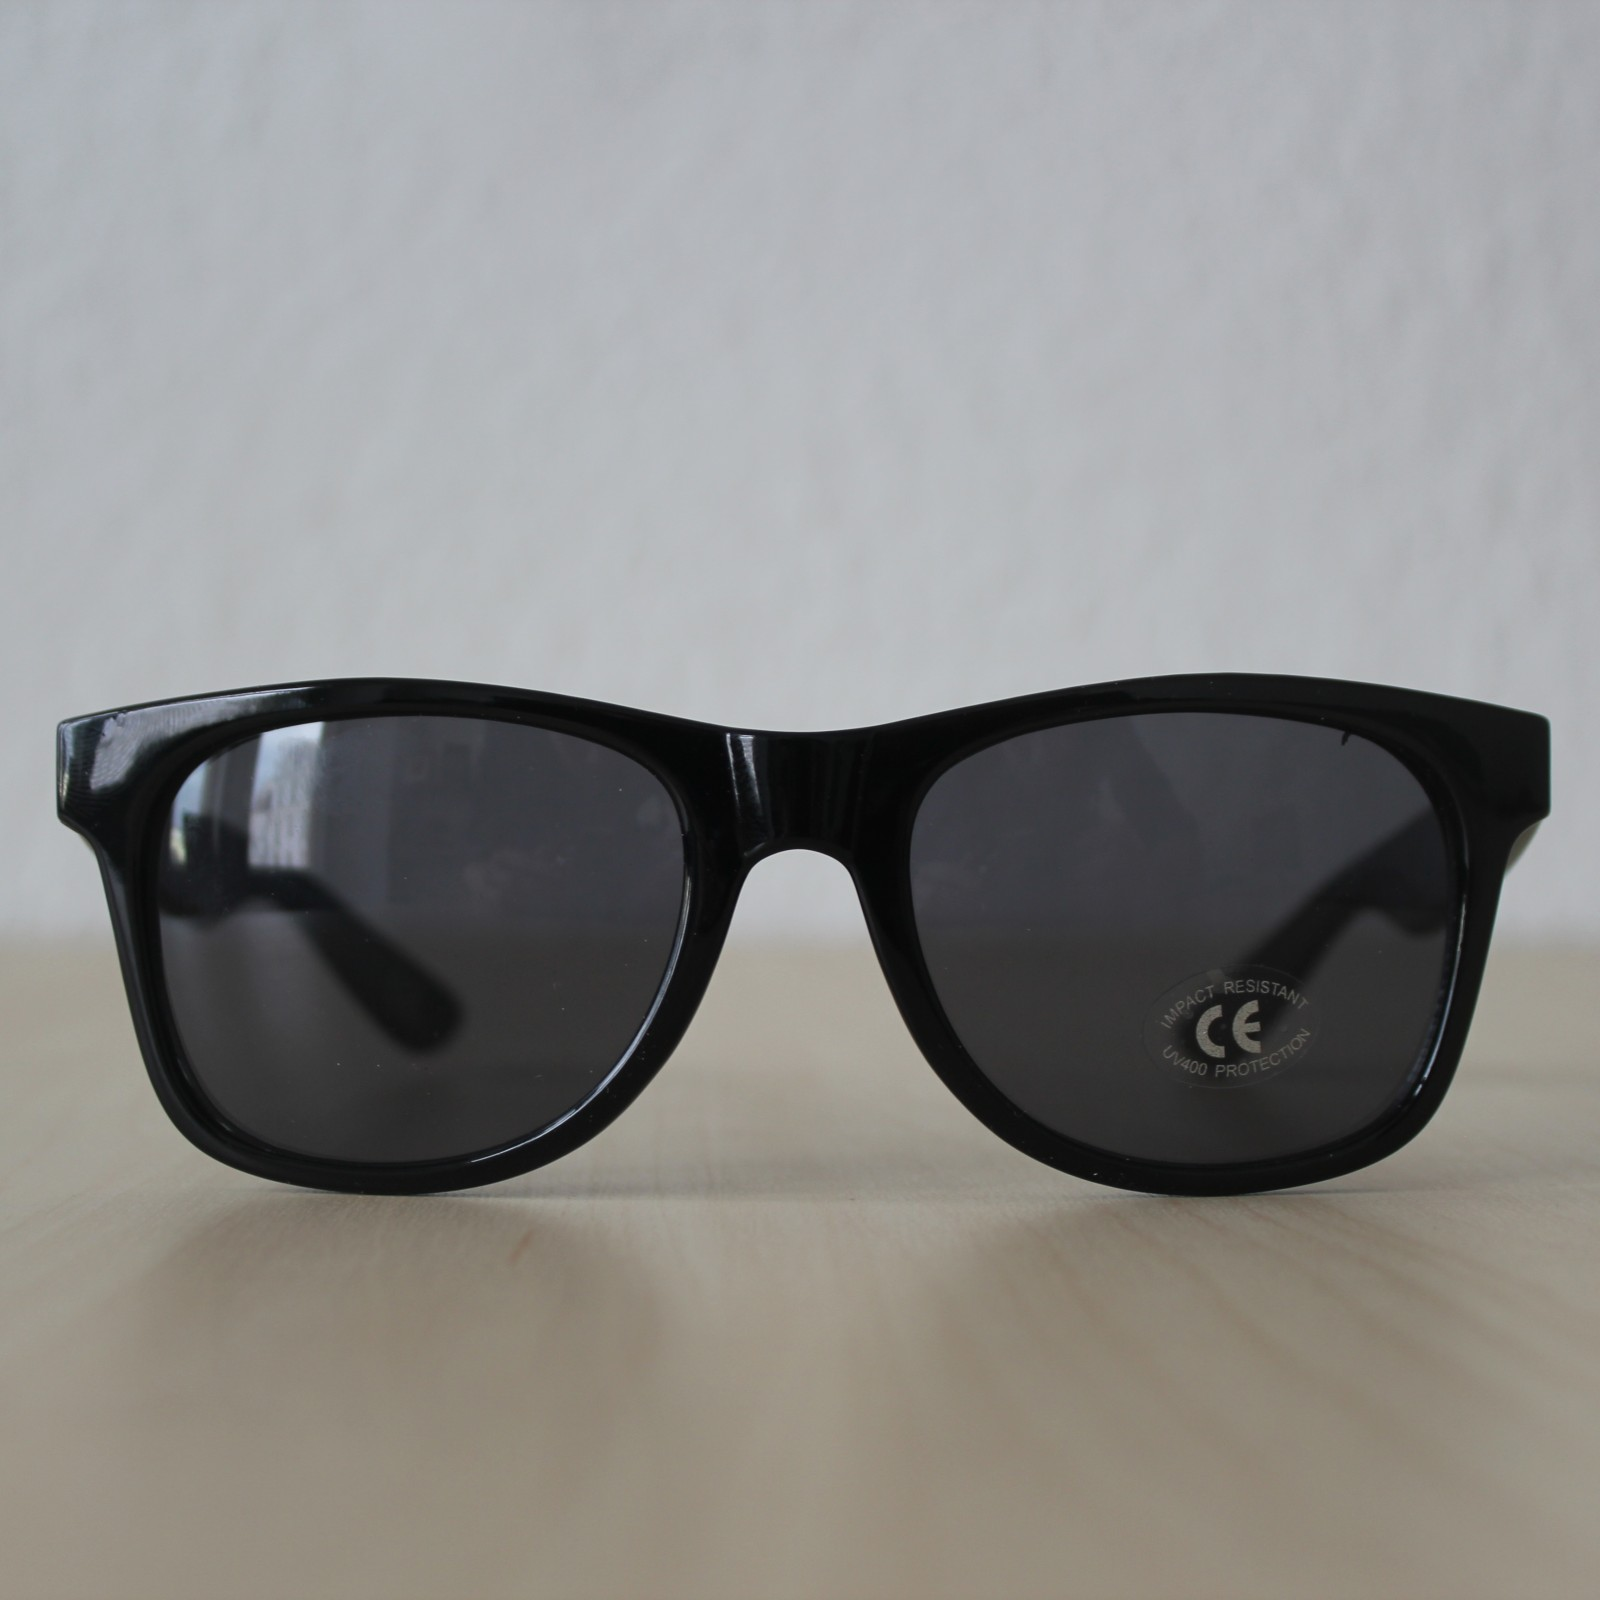 bf1358f5a5 Brýle Vans MN SPICOLI 4 SHADES Black